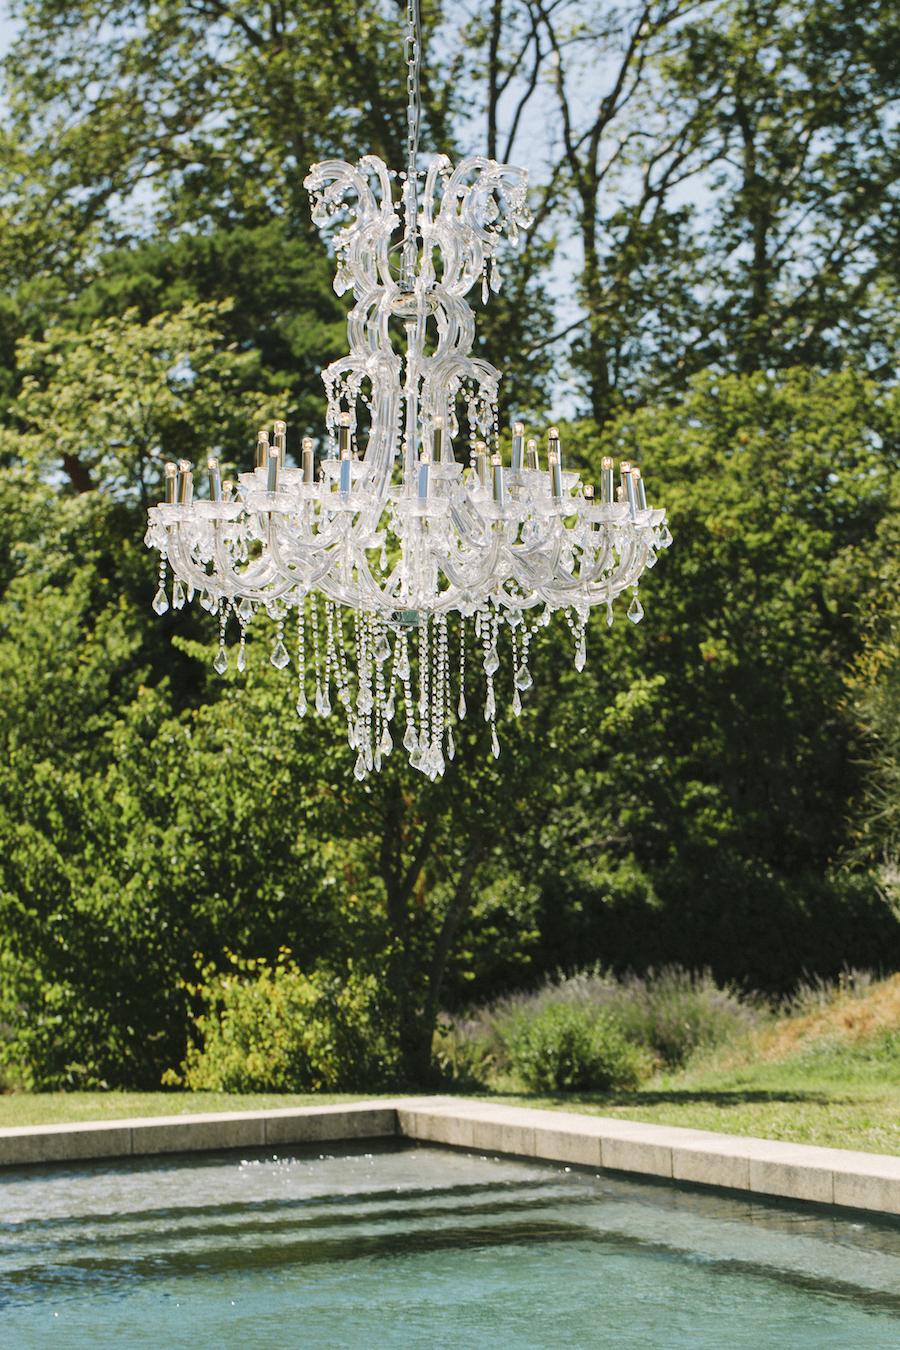 saya-photography-jewish-wedding-provence-rustic-lourmarin-le-galinier-23.jpg